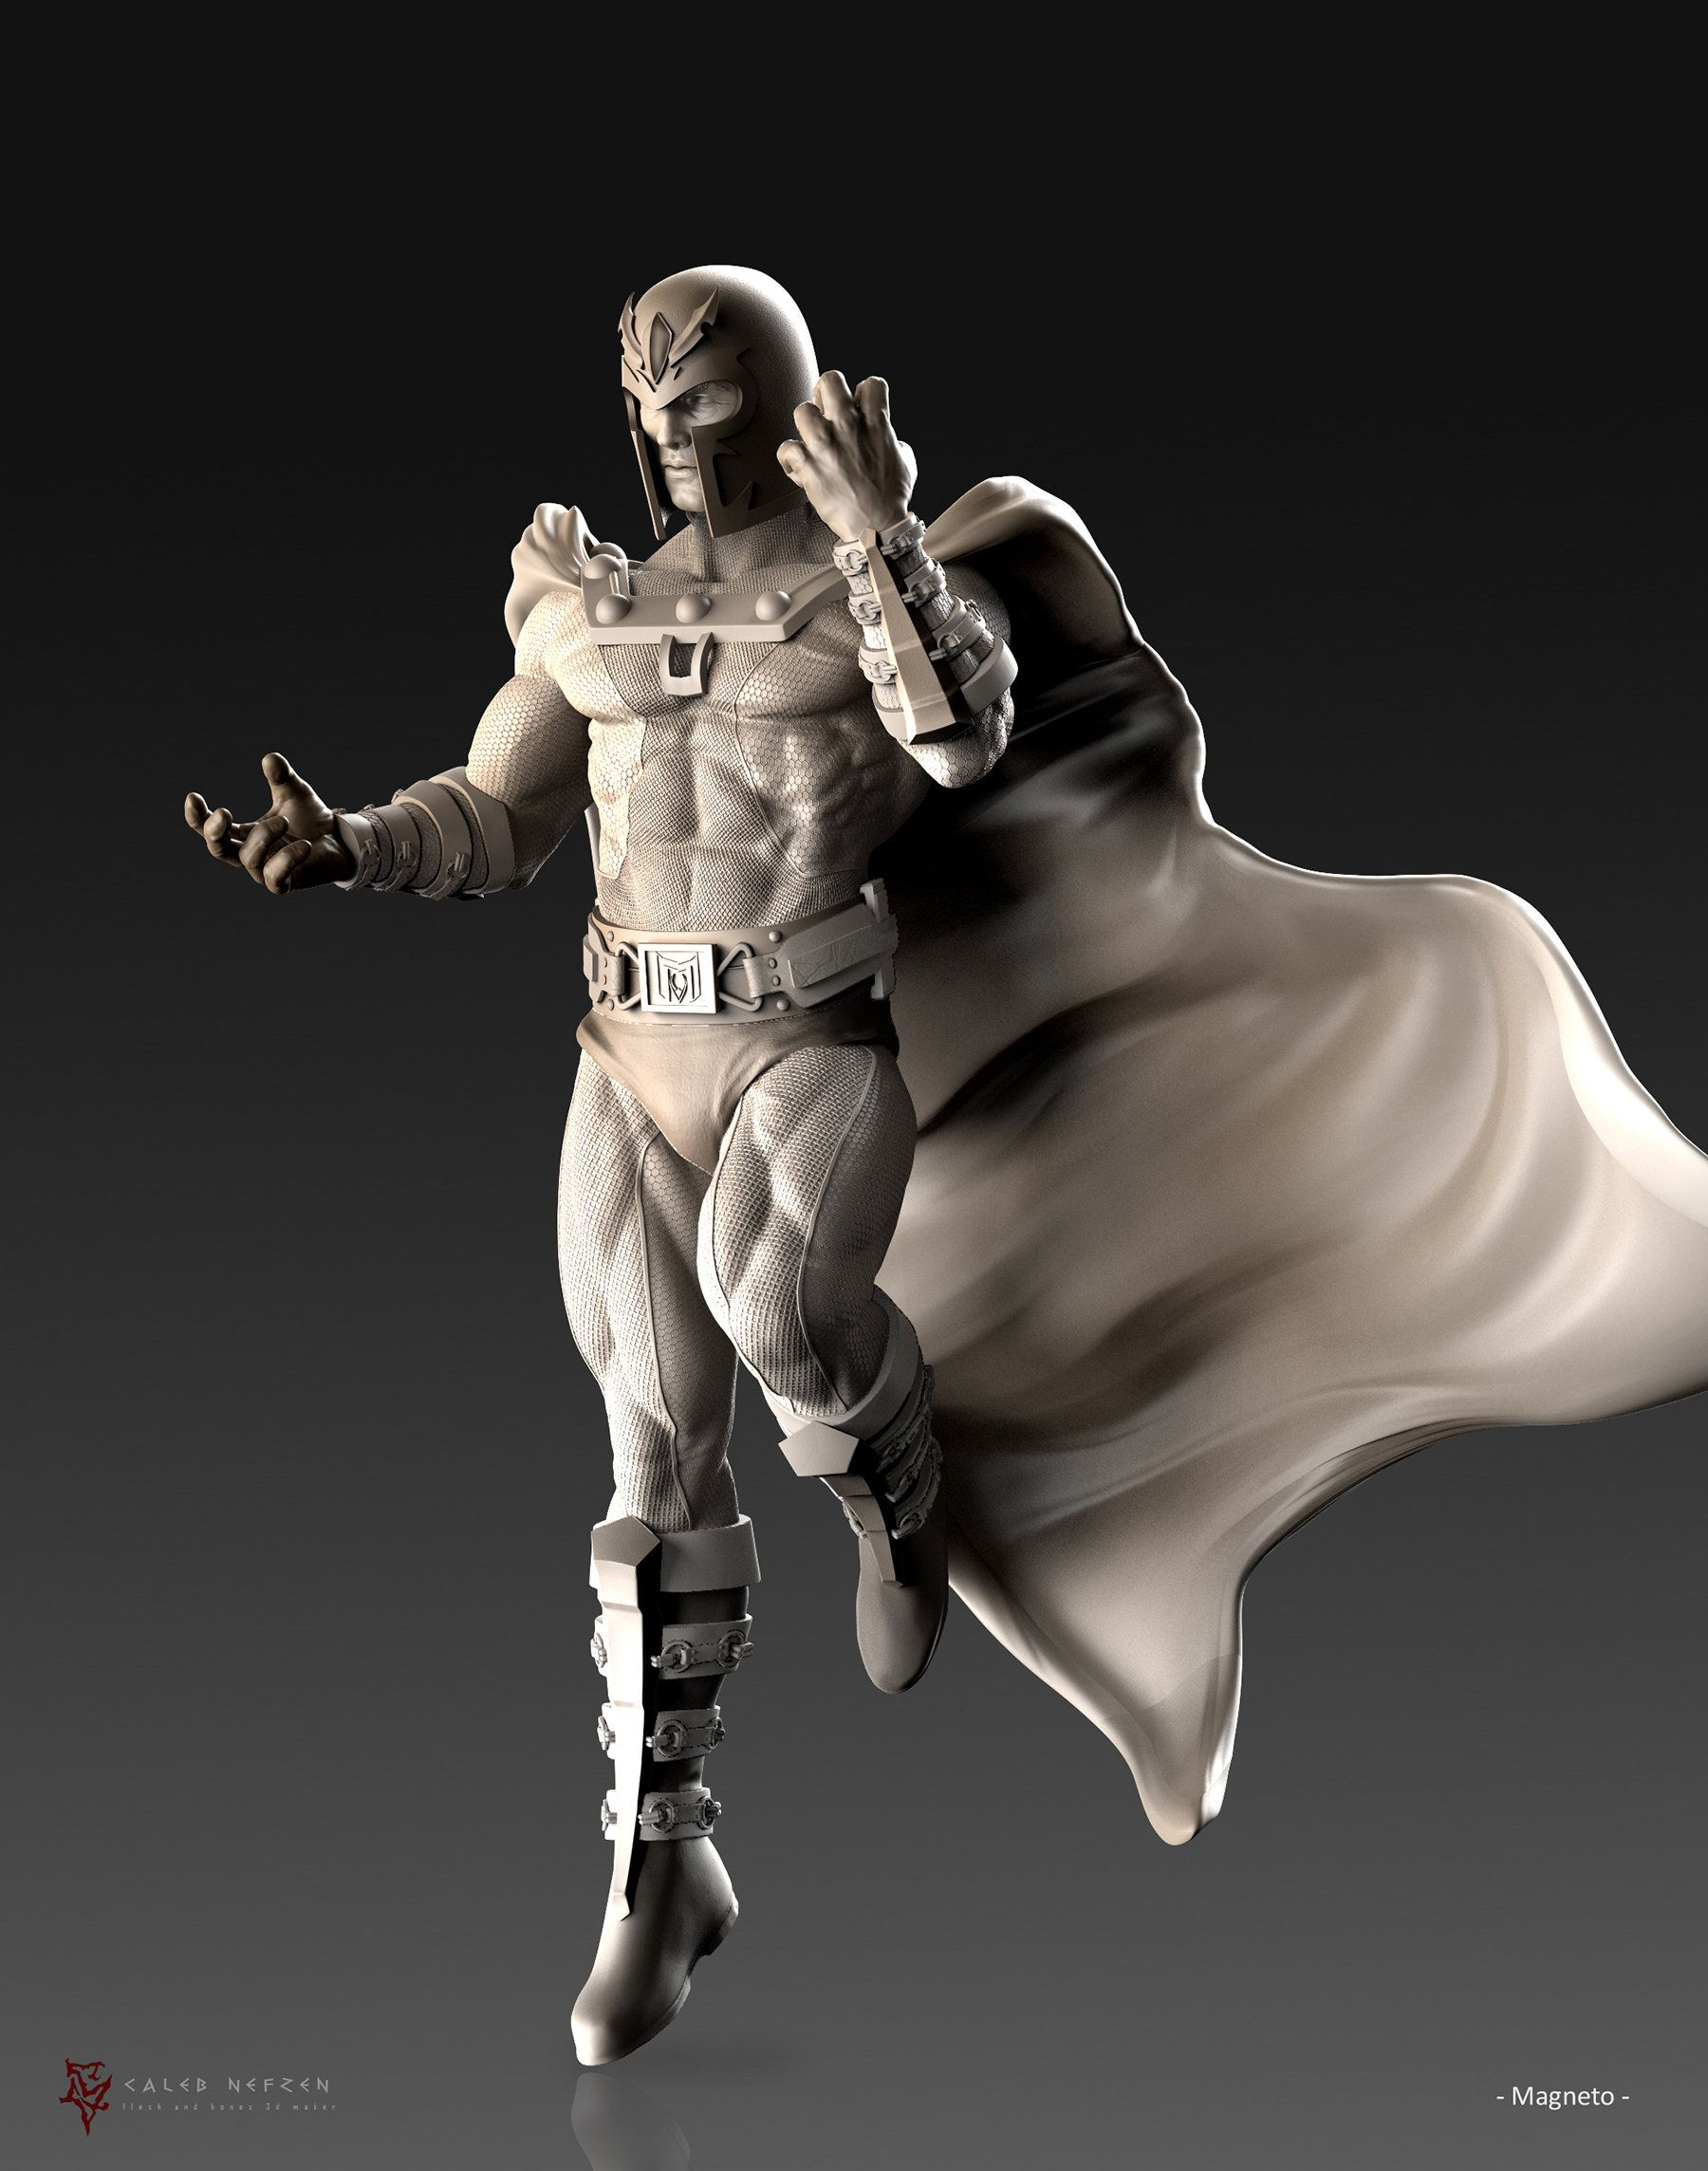 3D Model Magneto by Caleb Nefzen | Zbrush Tuts | Digital Sculpting ...